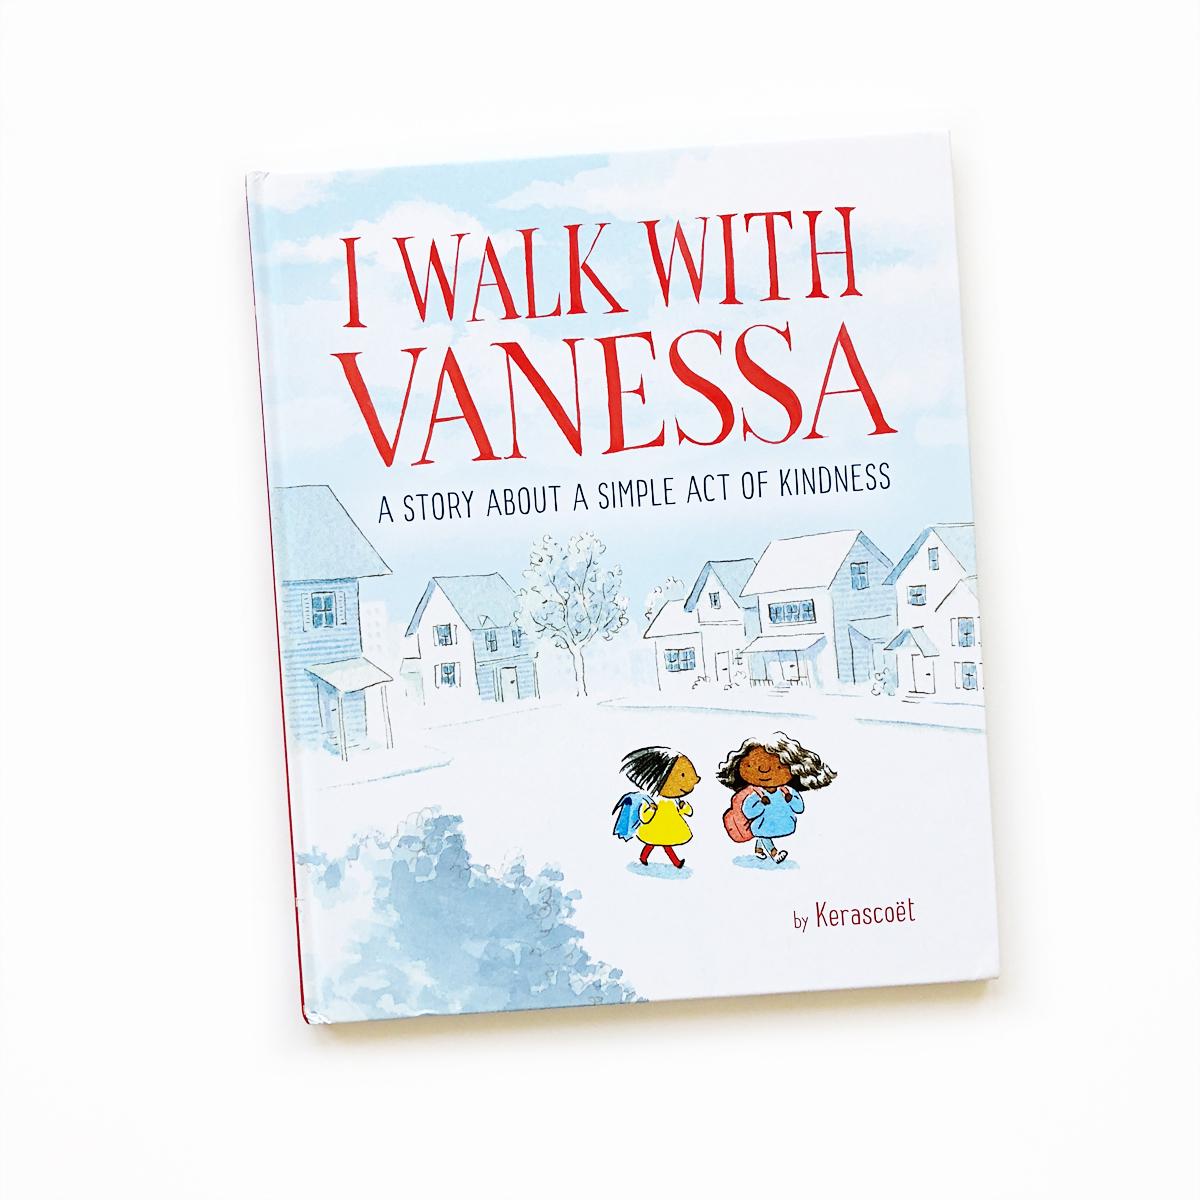 I Walk With Vanessa | Books For Diversity